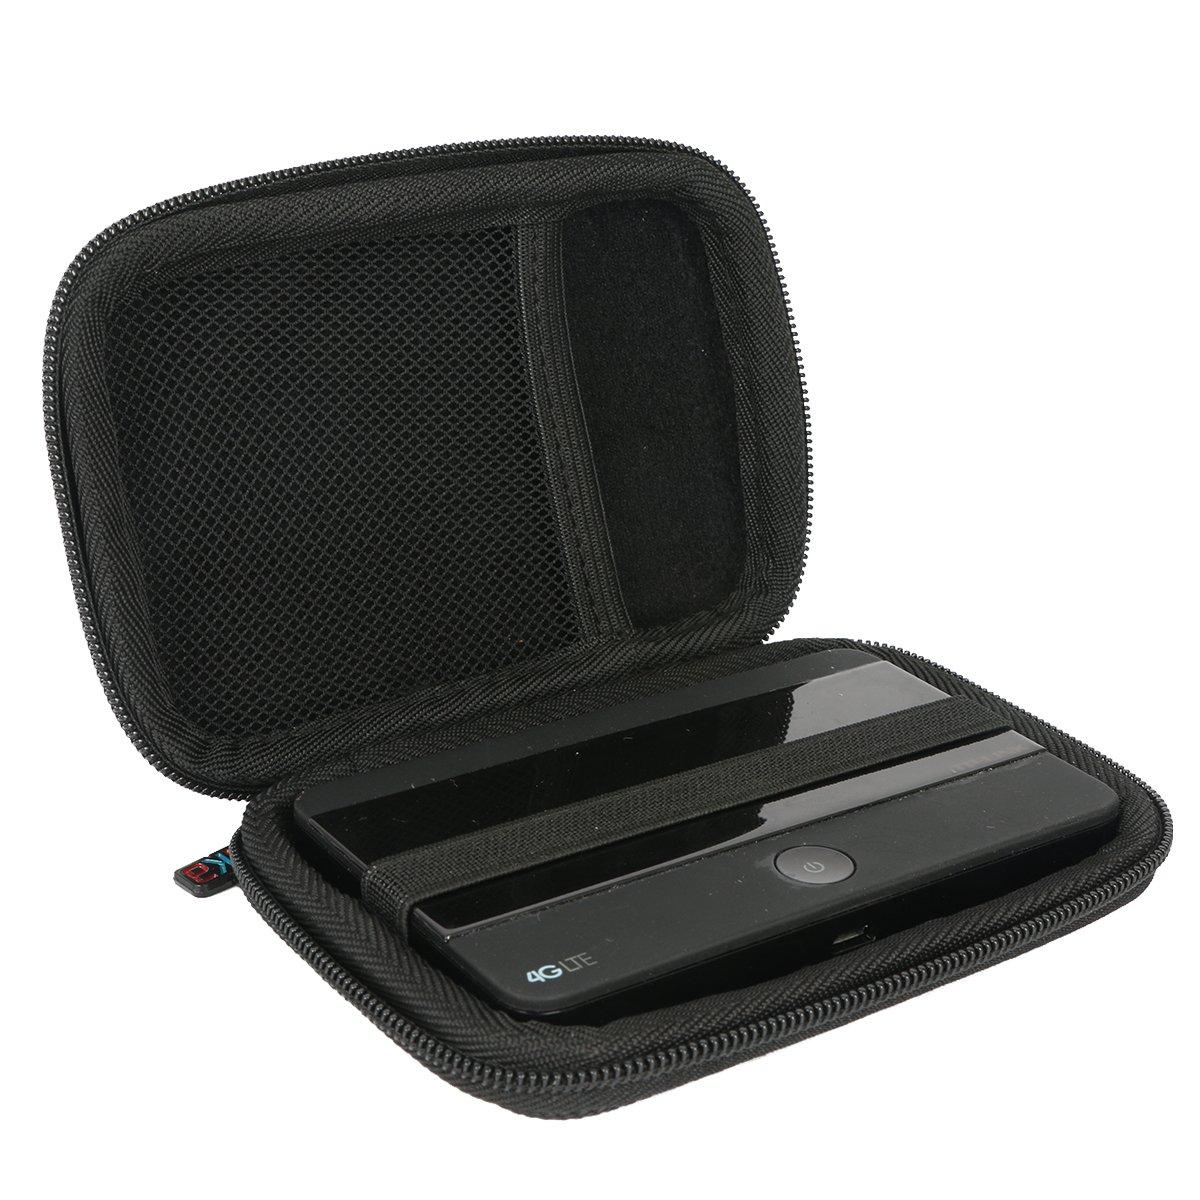 khanka para TP-Link M7350 - Enrutador inalámbrico 4G MiFi Móvil EVA Duro Viaje Estuche Bolso Funda: Amazon.es: Electrónica